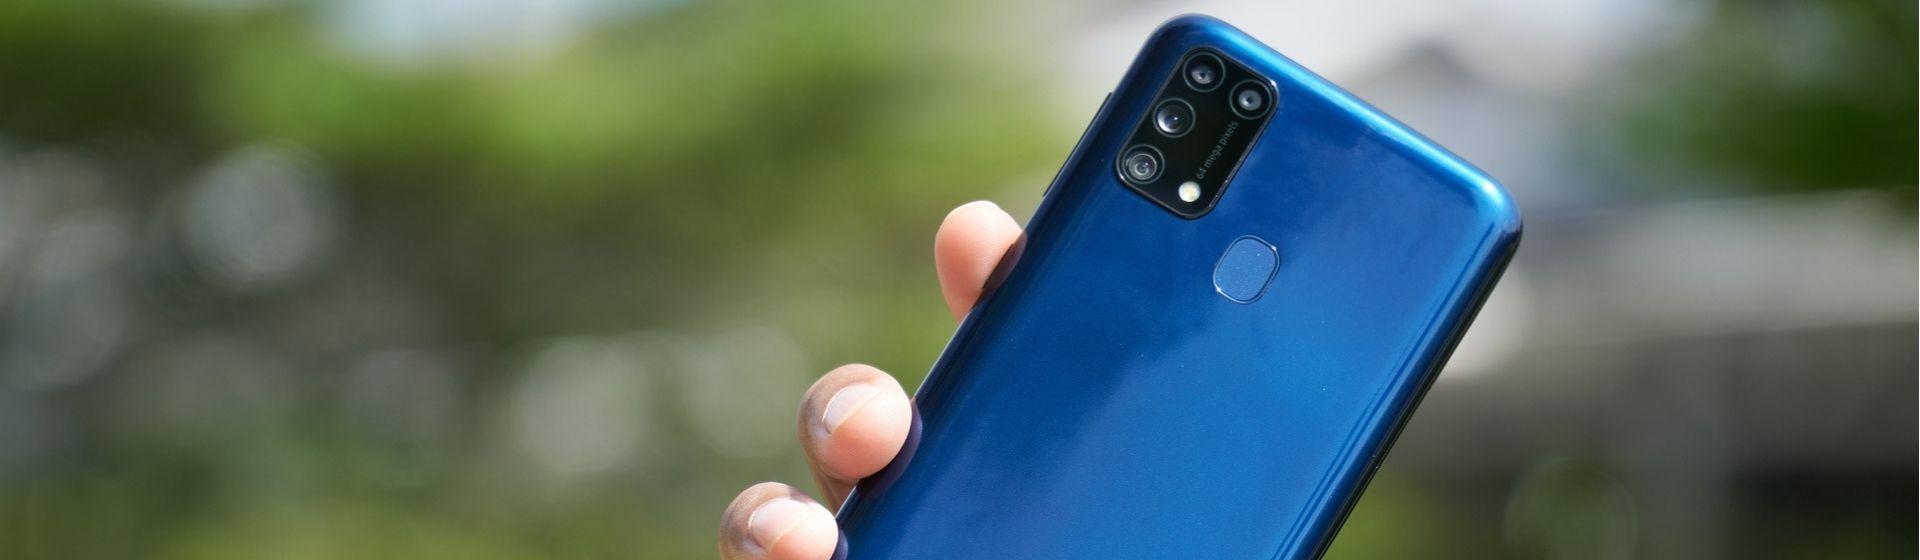 Galaxy M31: veja a análise de ficha técnica desse smartphone Samsung